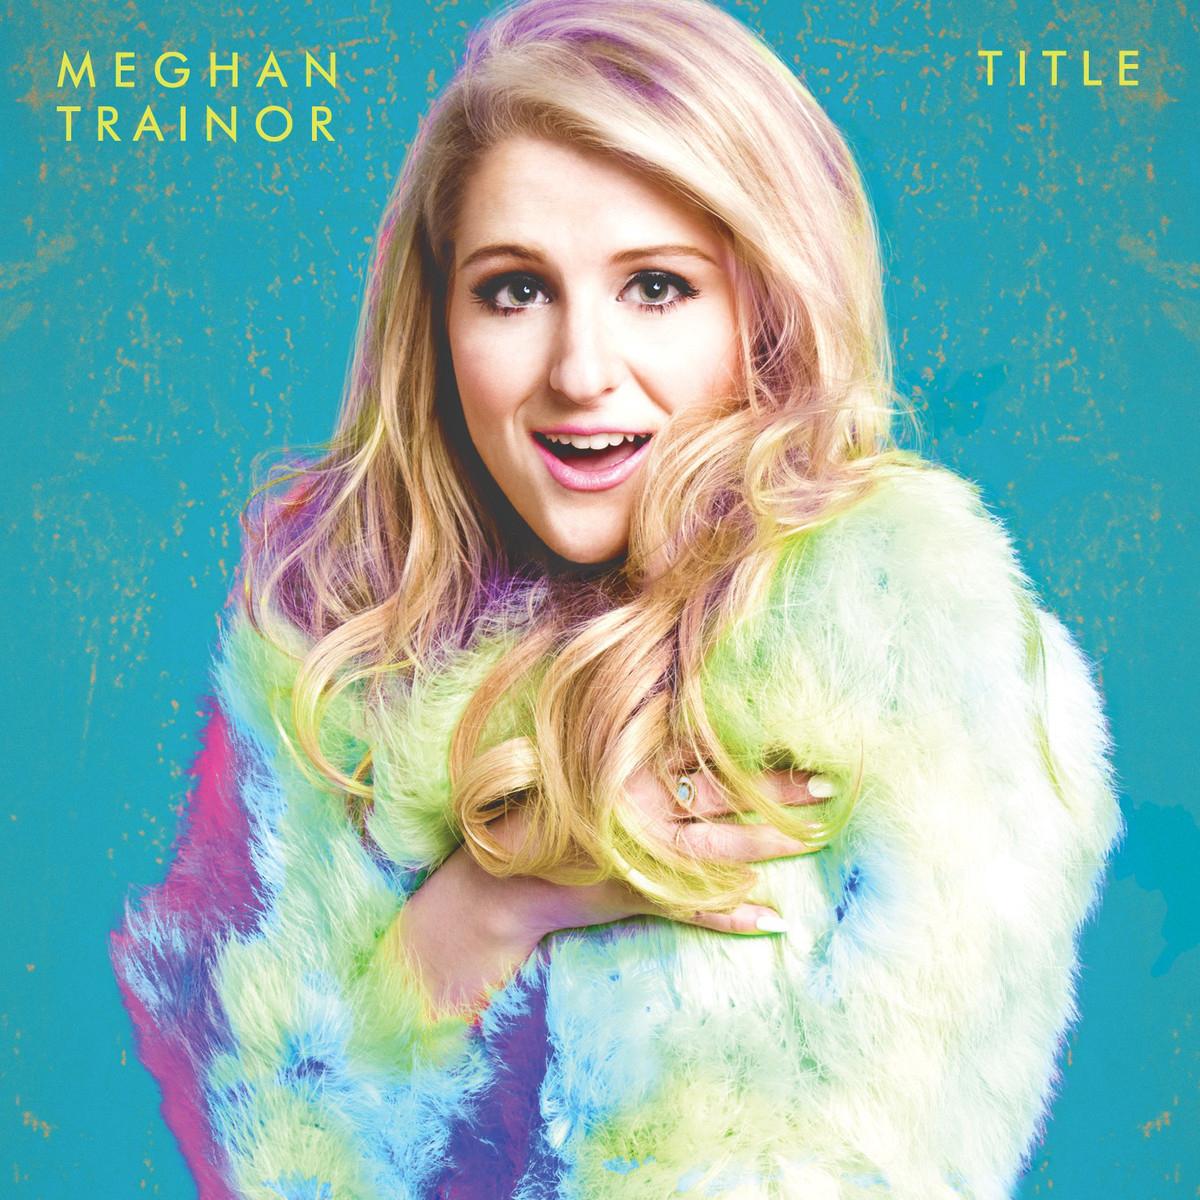 Meghan Trainor 'Title' Via Epic Records